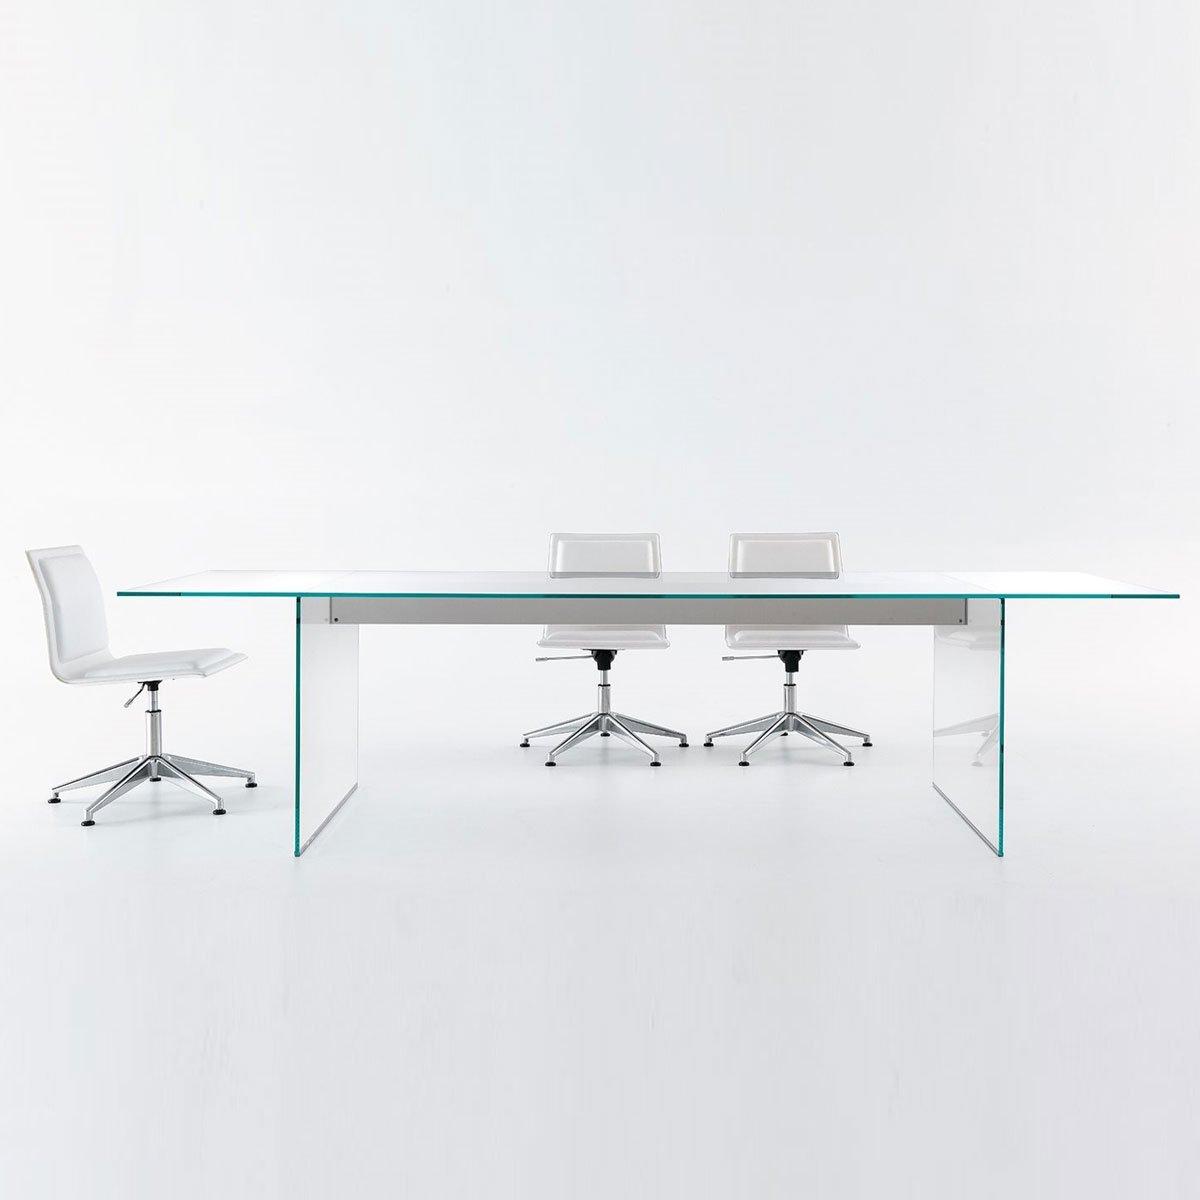 Air glass table gallotti & Radice